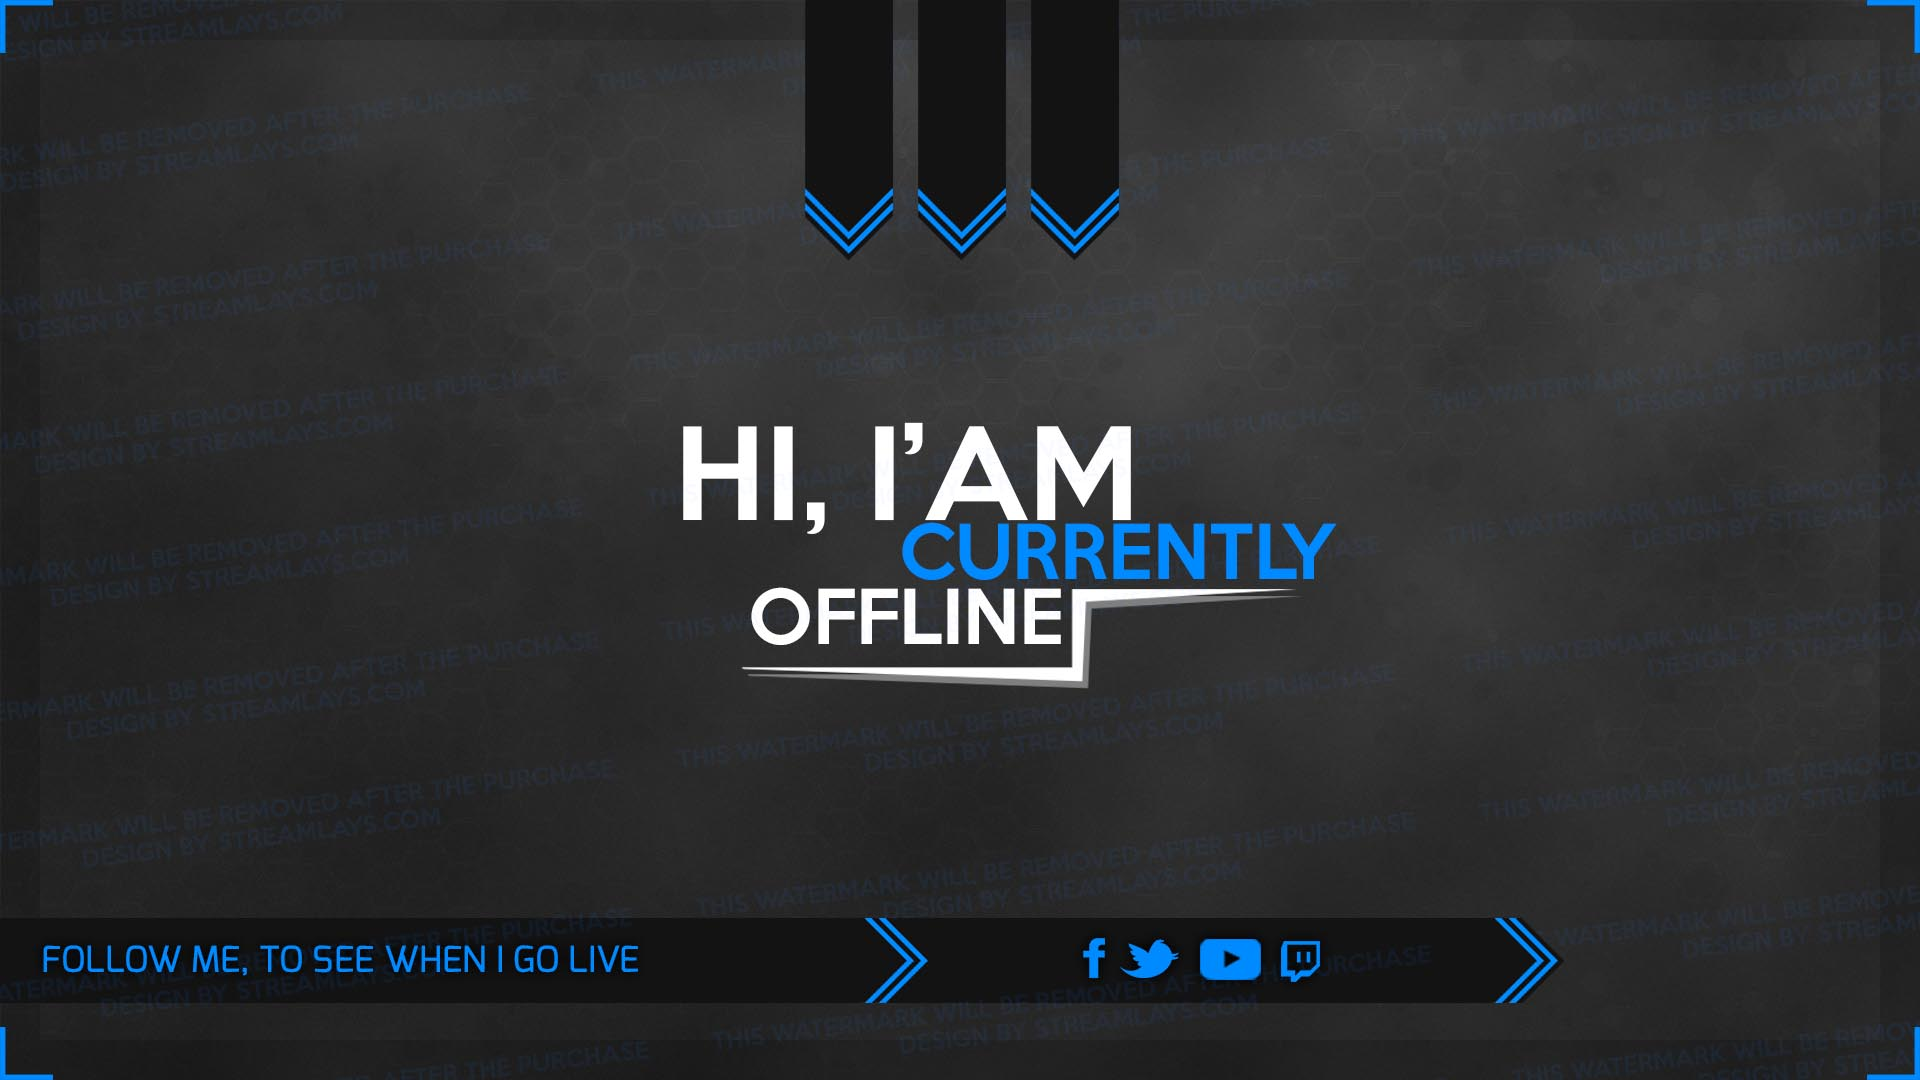 template offline screen